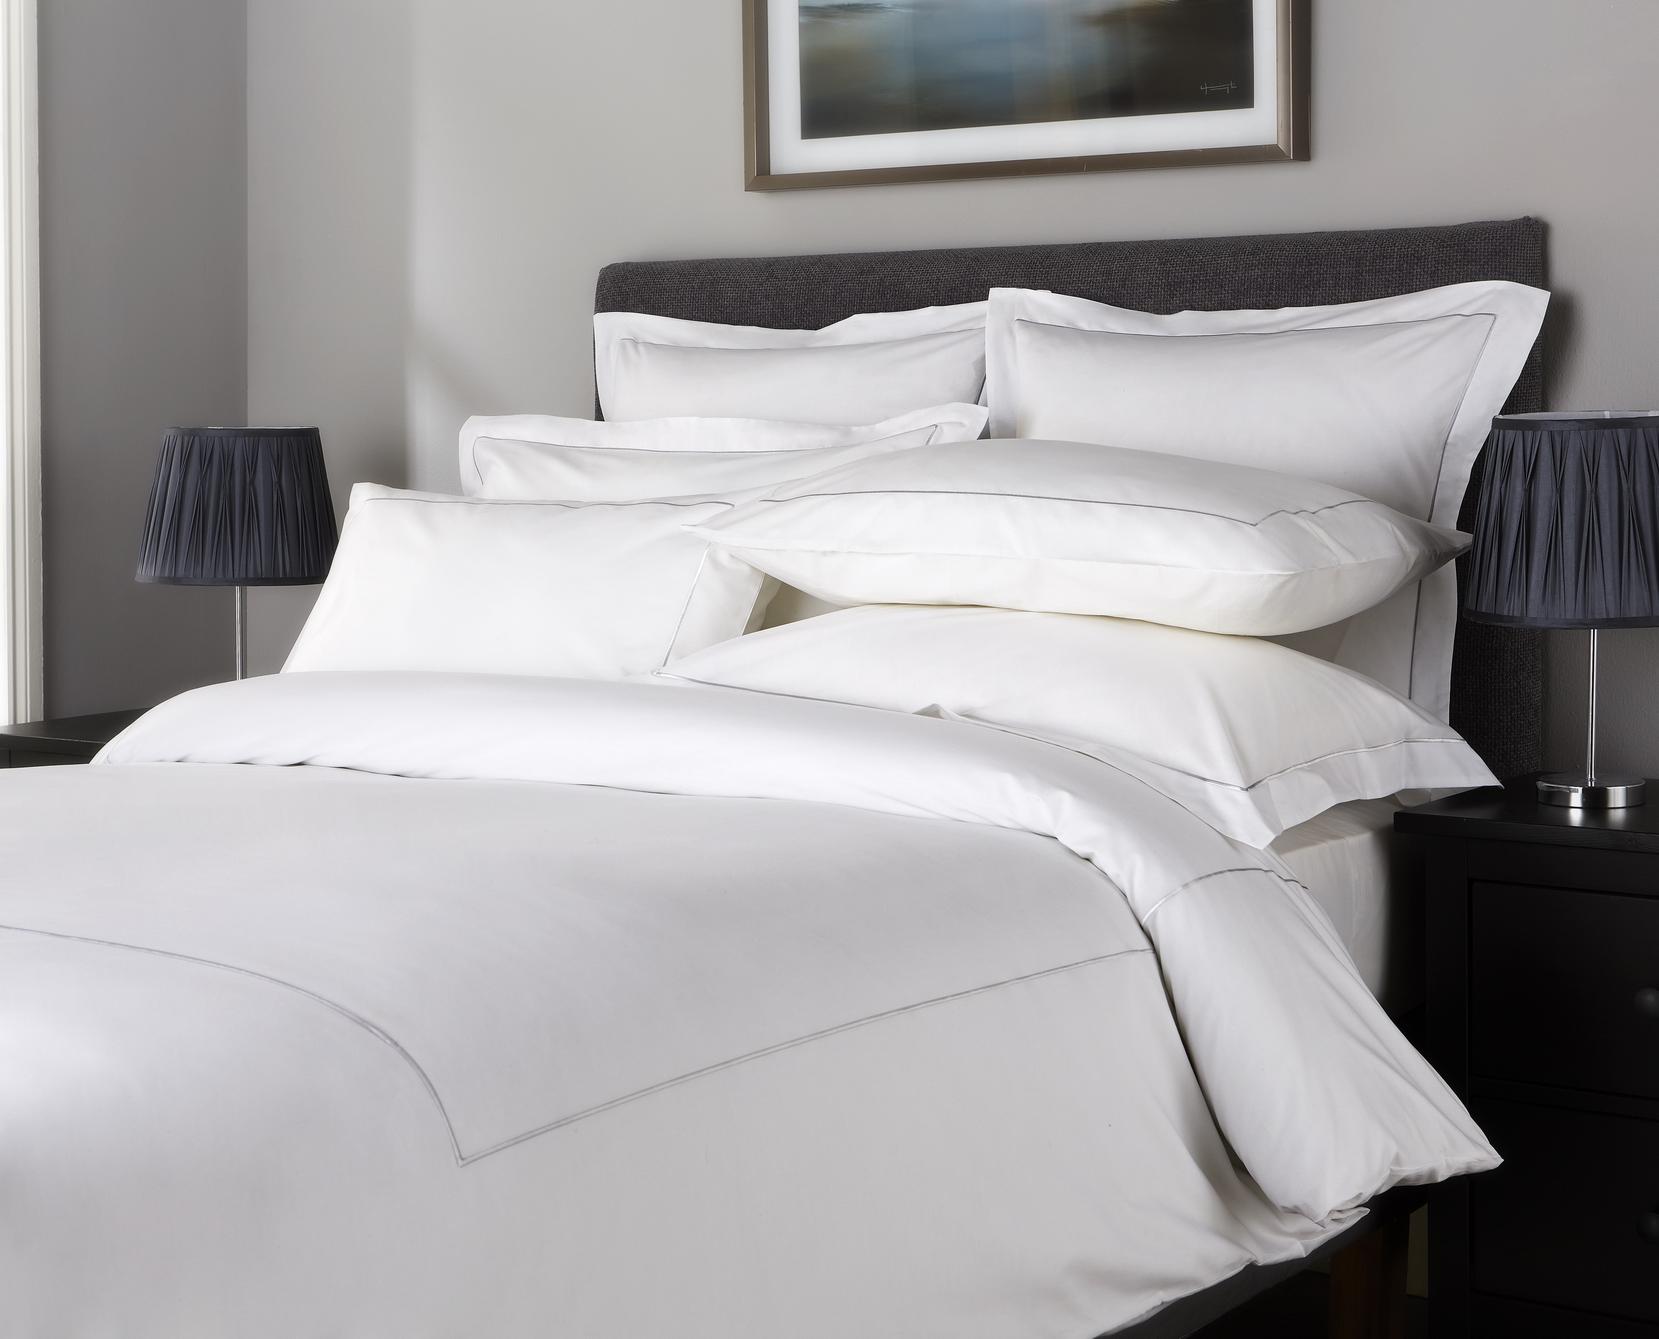 Lenjerie de pat Behrens Single Row colectia Embellished Design 200x200cm 2 fete perna 50x75cm alb-gri